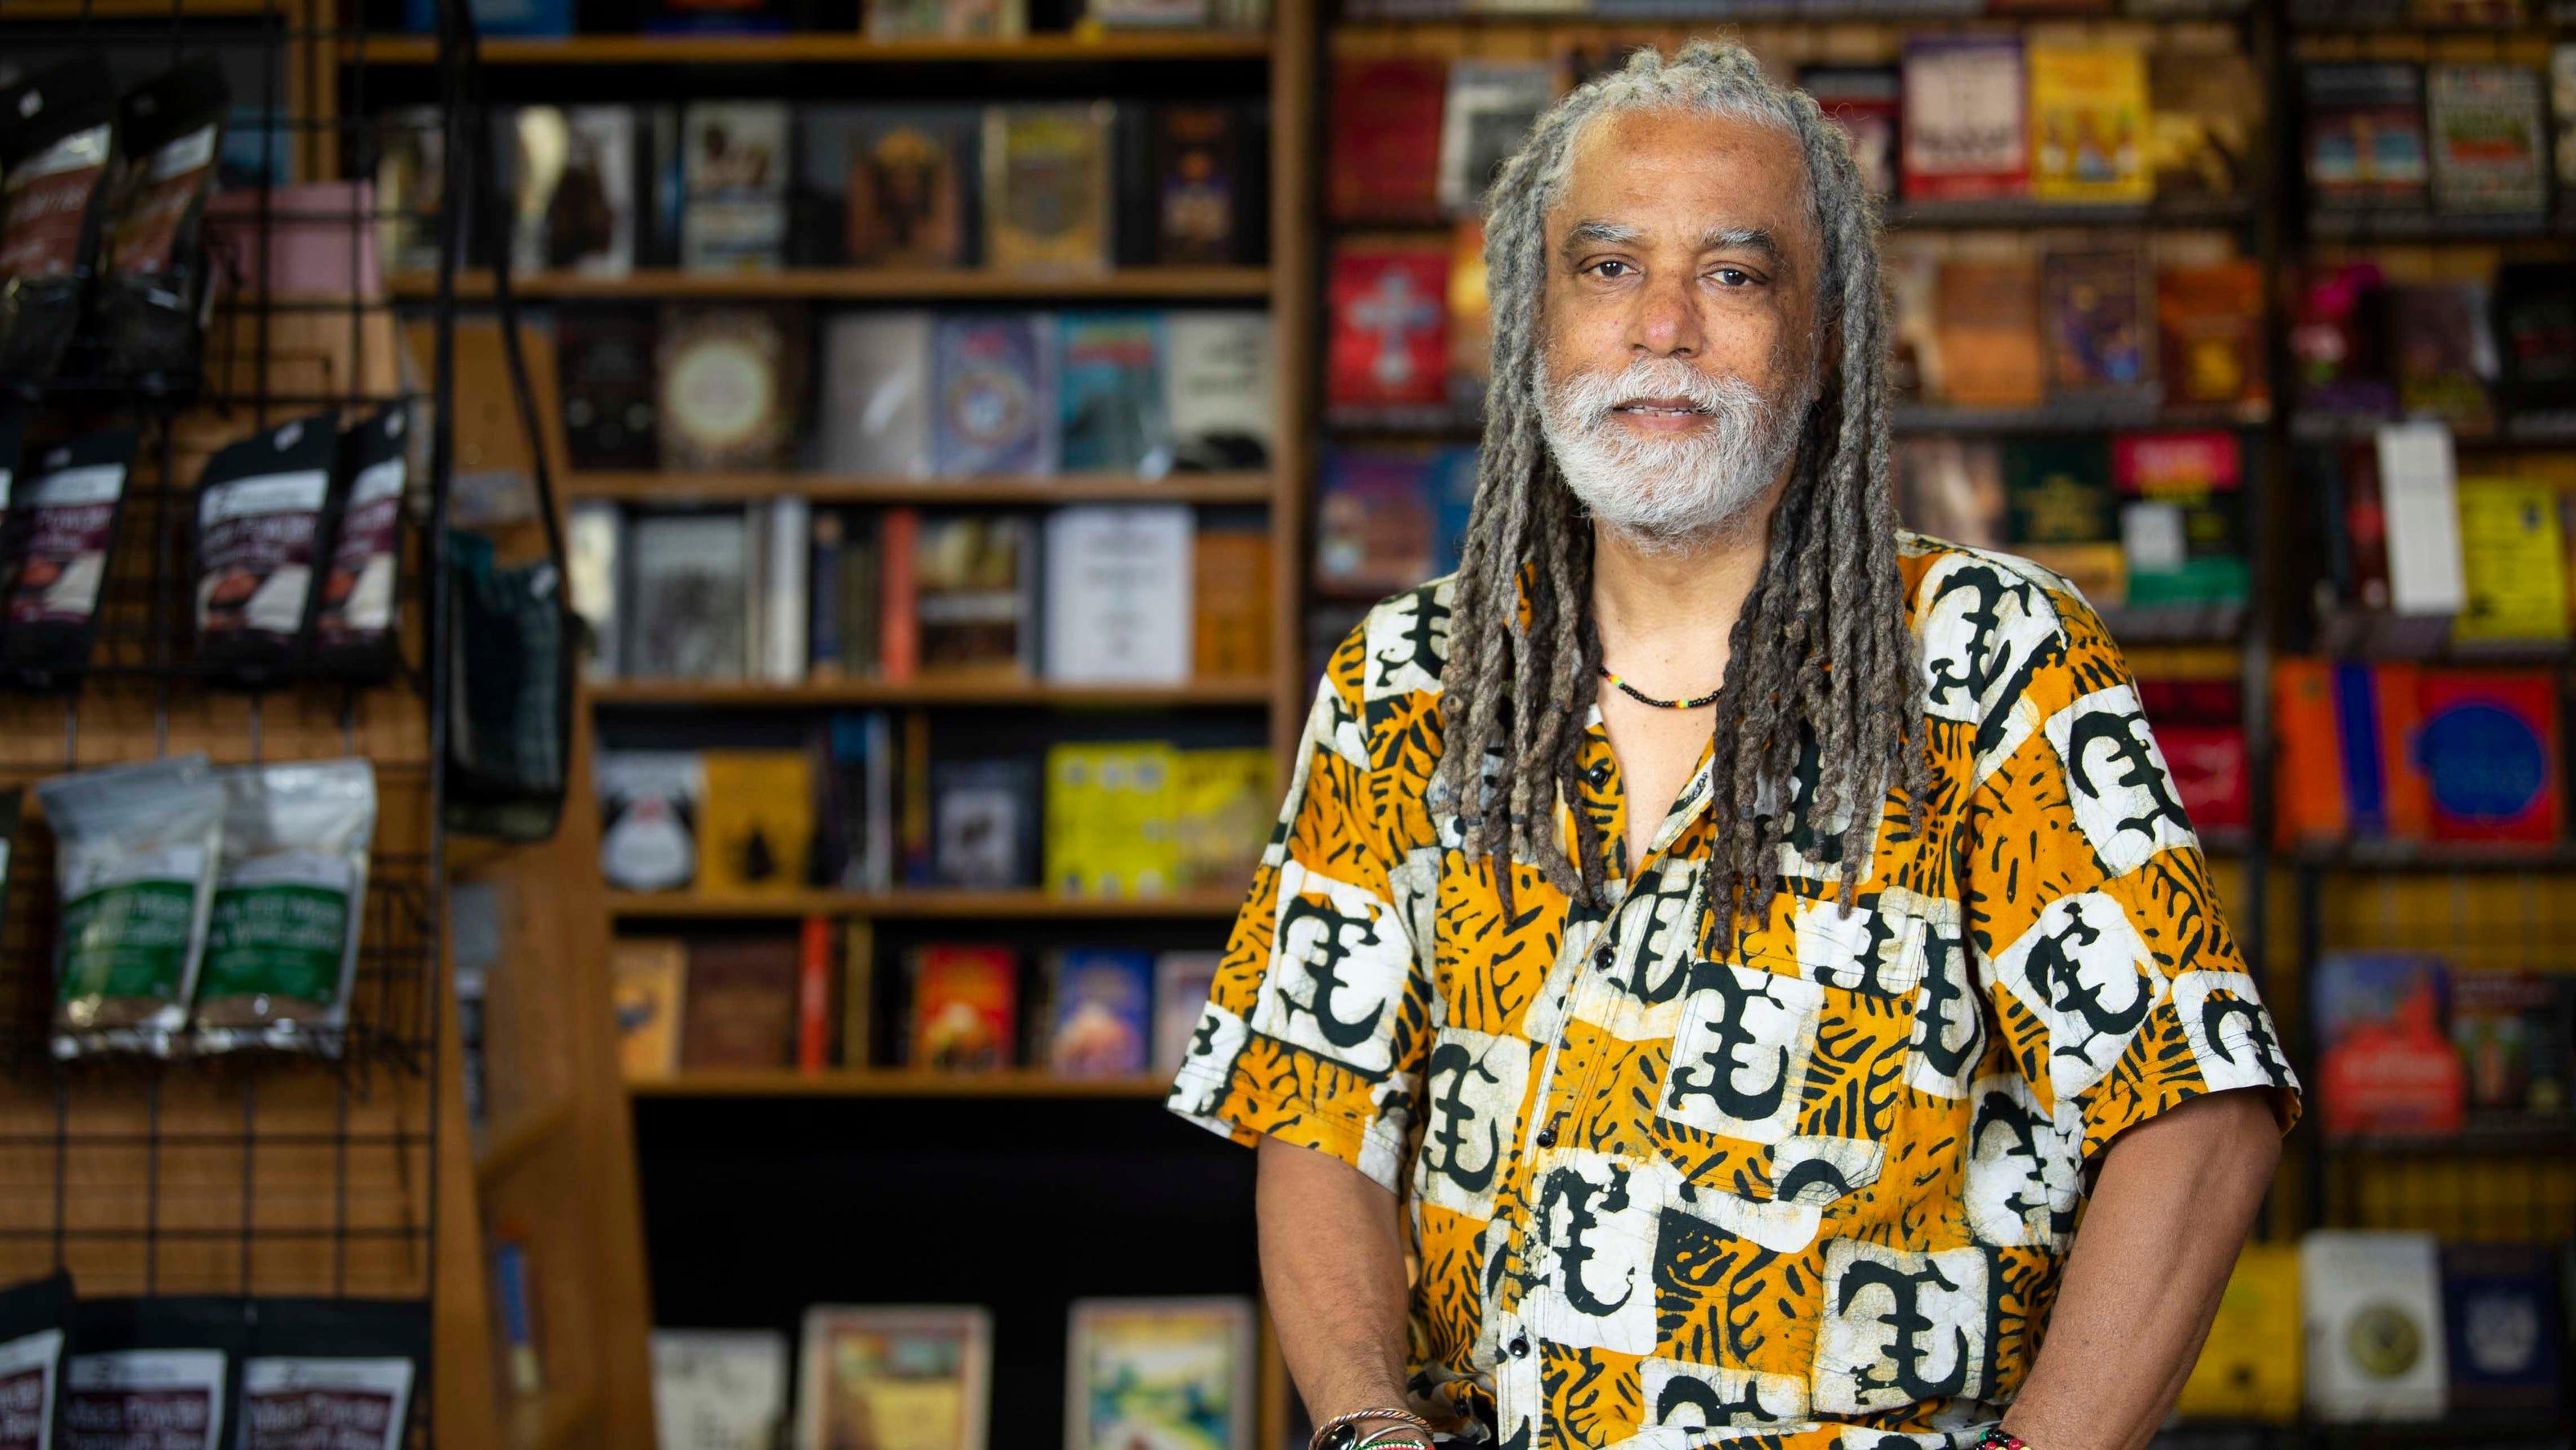 North Nashville Bookstore Alkebu-Lan Images Celebrates 35 Years With Record Profits